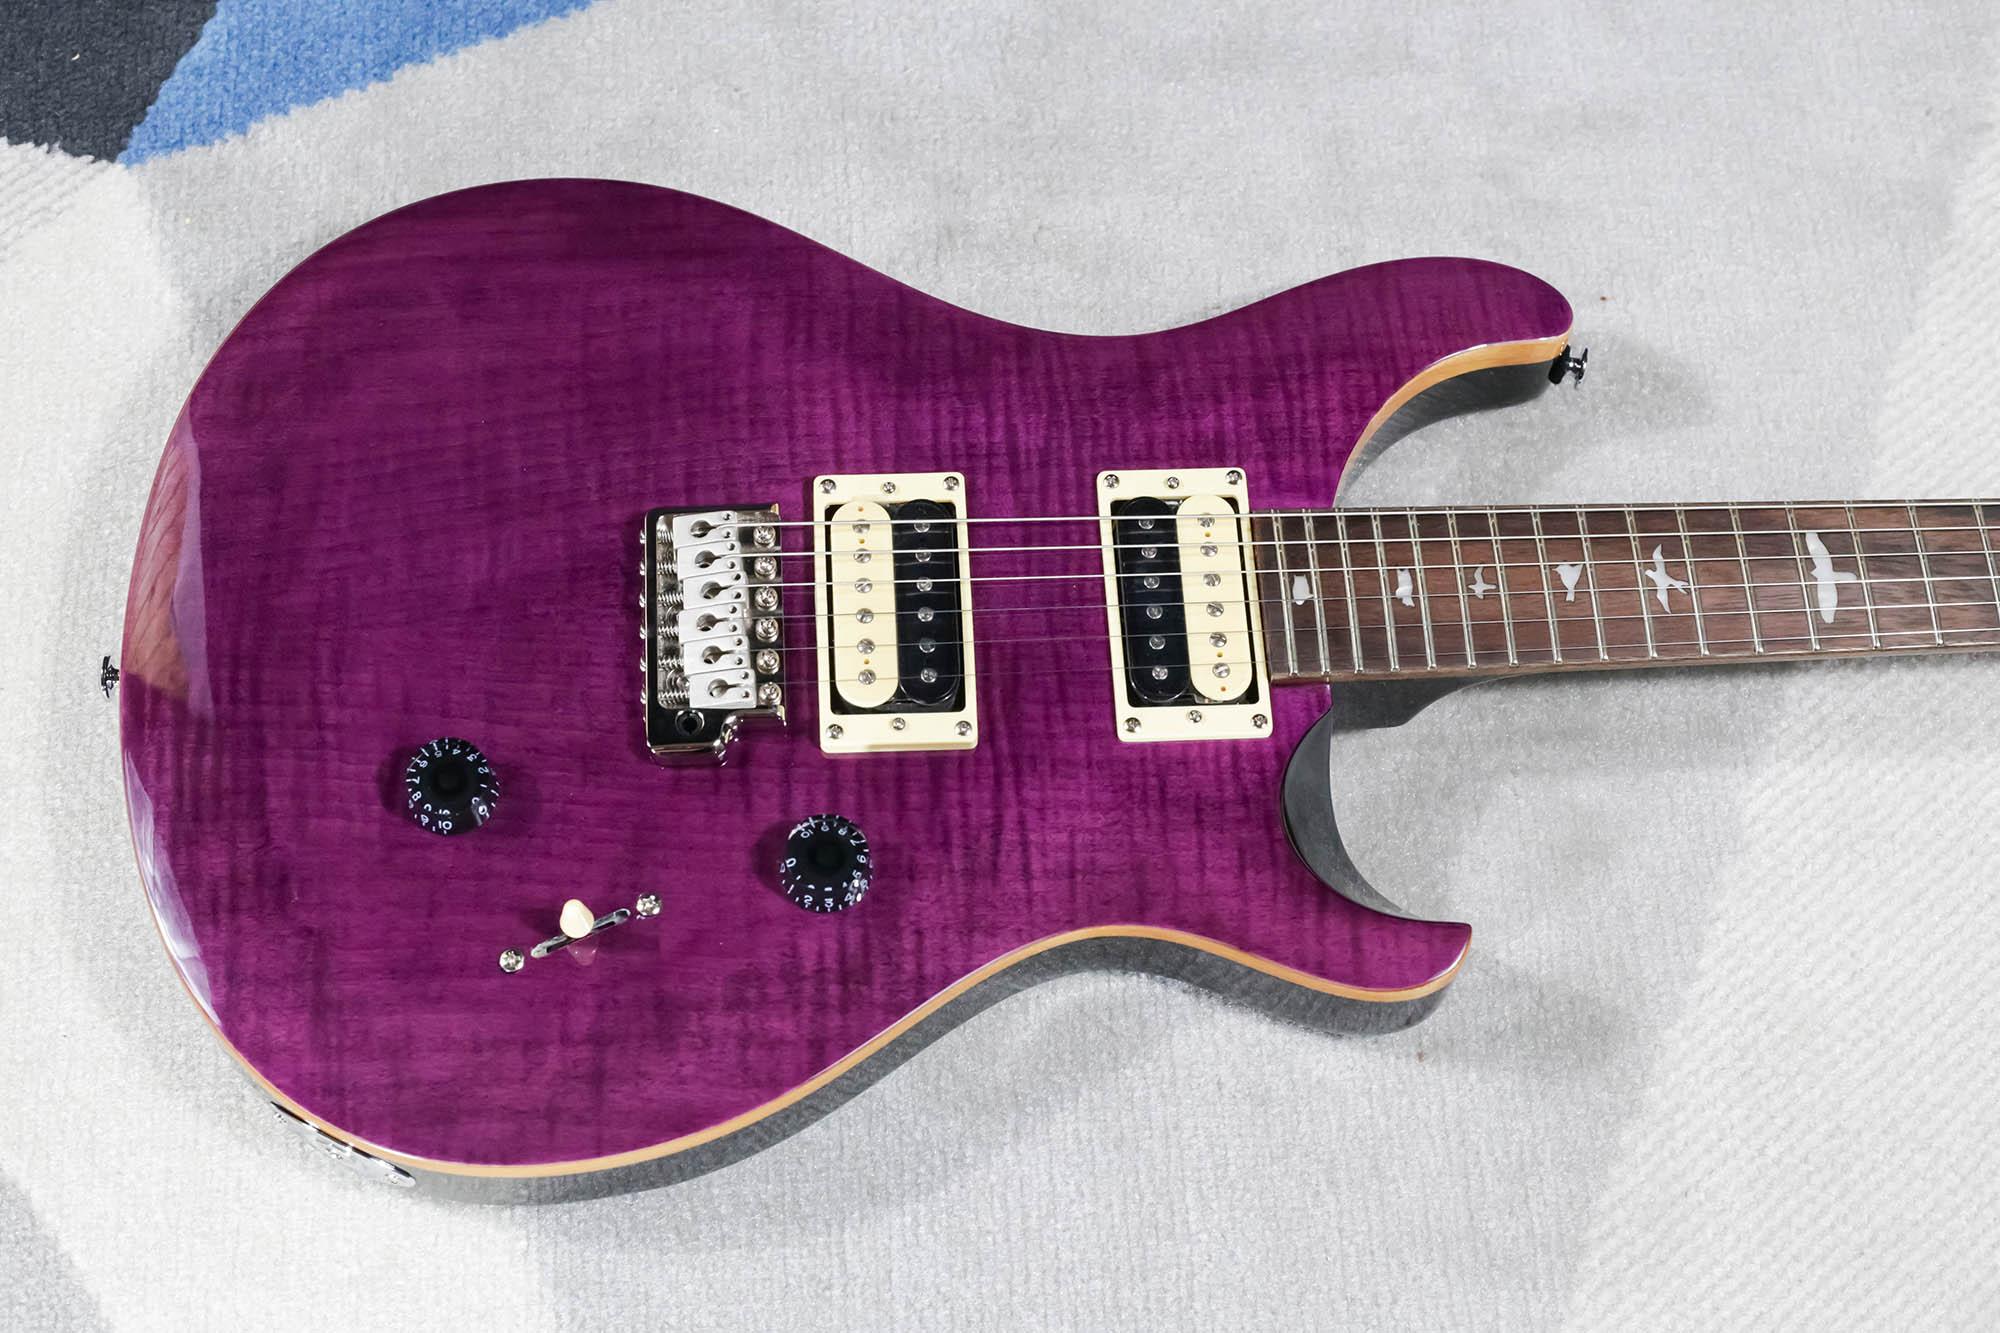 Guitarra PRS CU4 SE CUSTOM 24 Amethyst